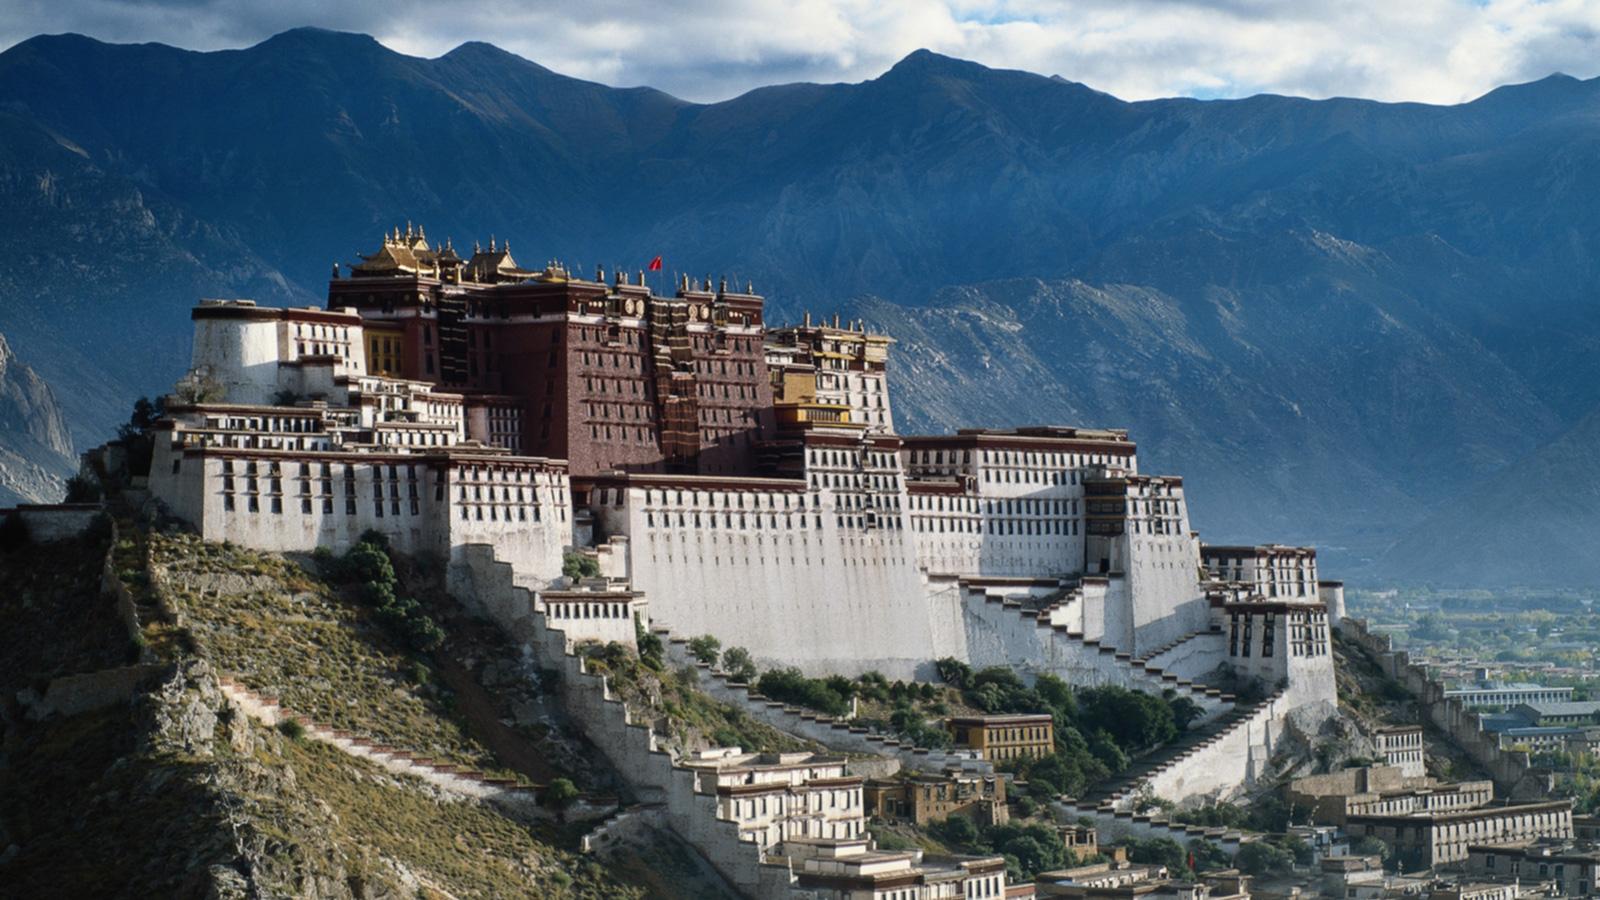 Lhasa-Potala-CITS-2.jpg